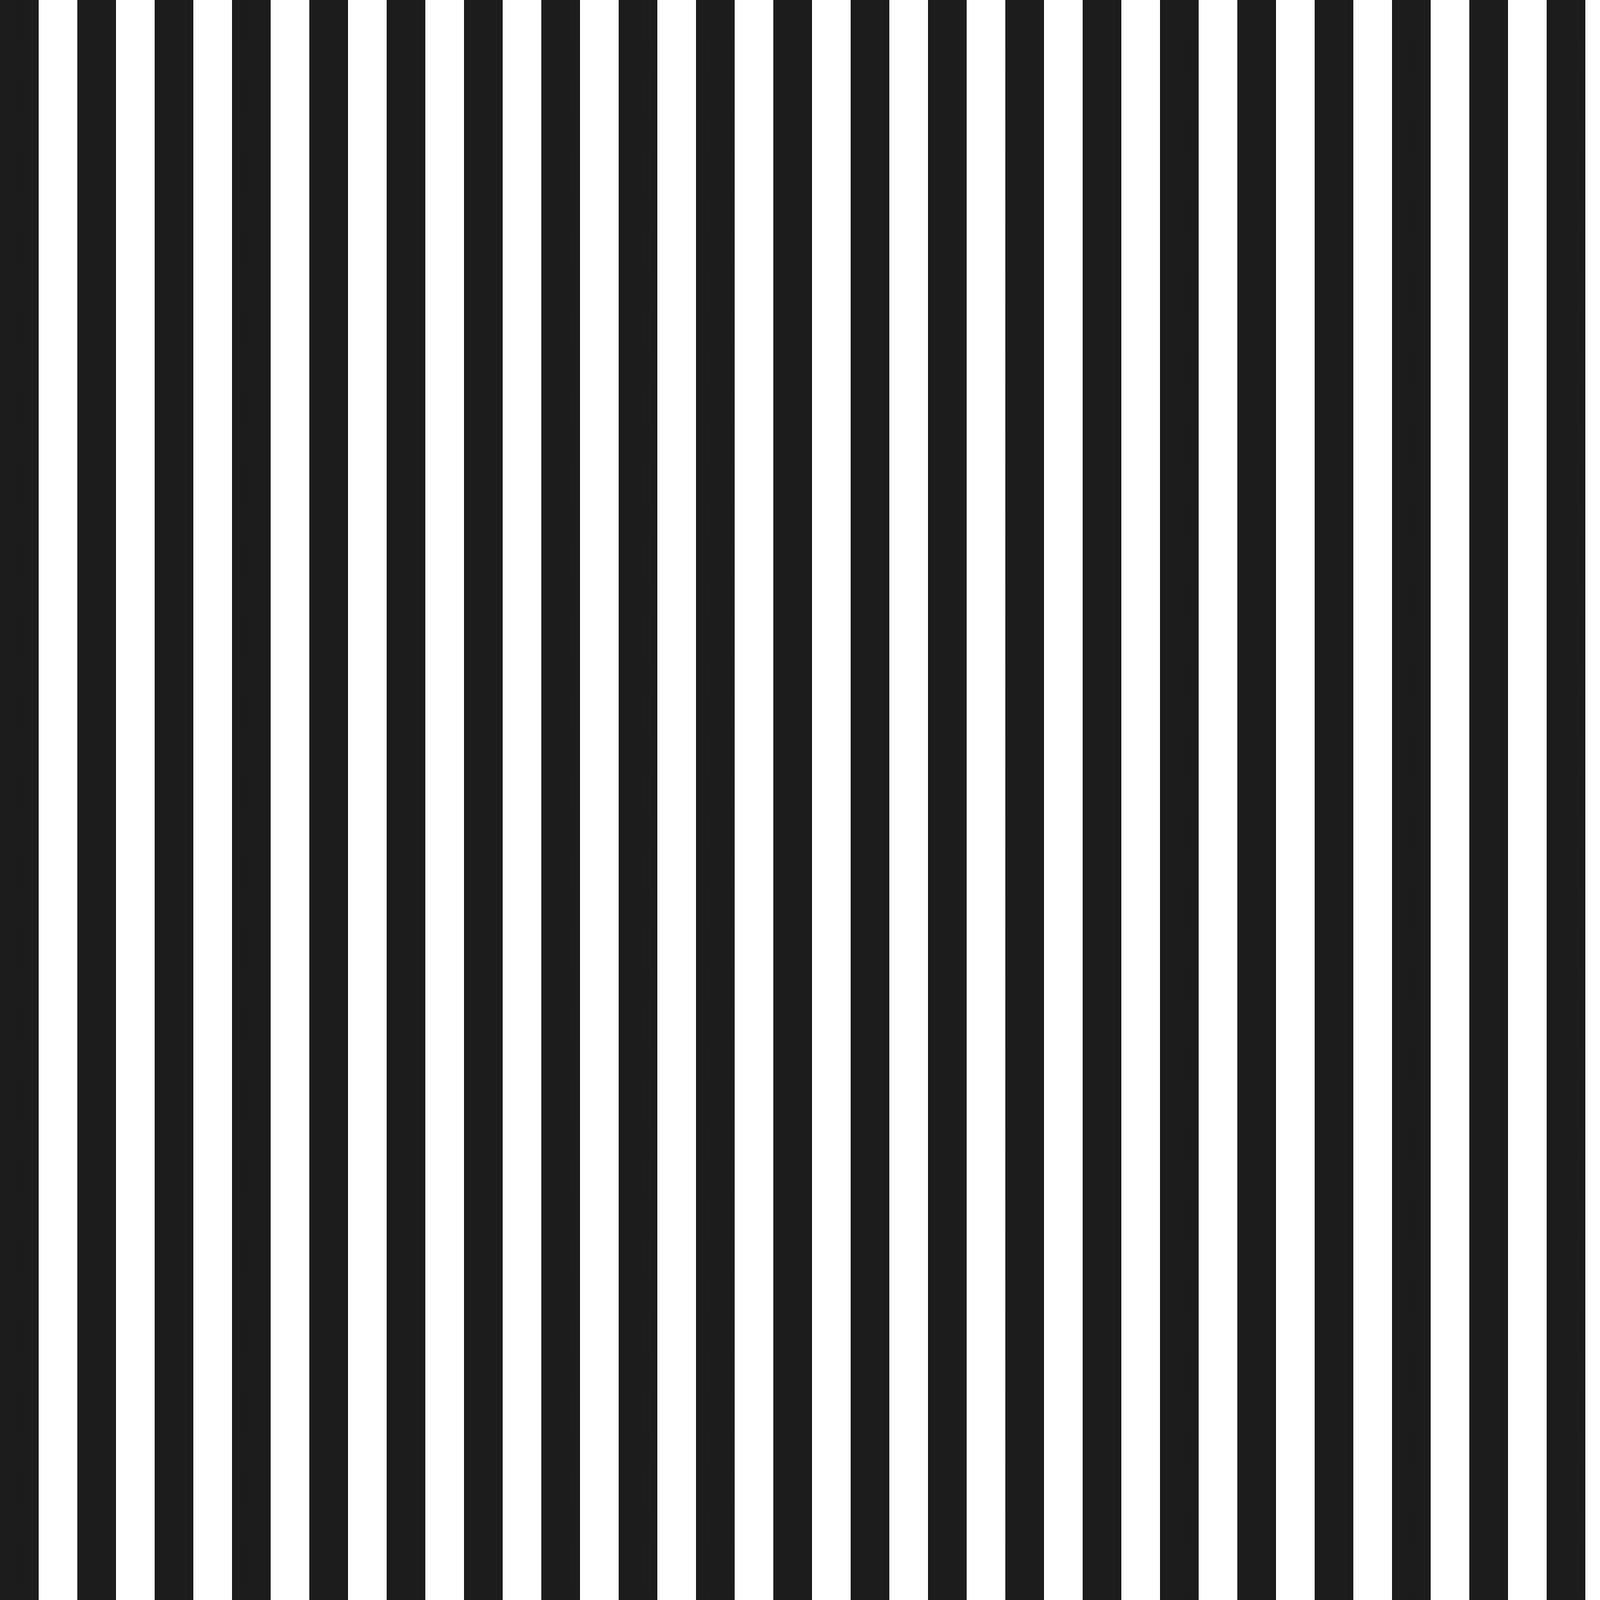 stripes paper scrapbook digital 1600 scrapbooking patterns wallpapersafari stamps scrapbooks